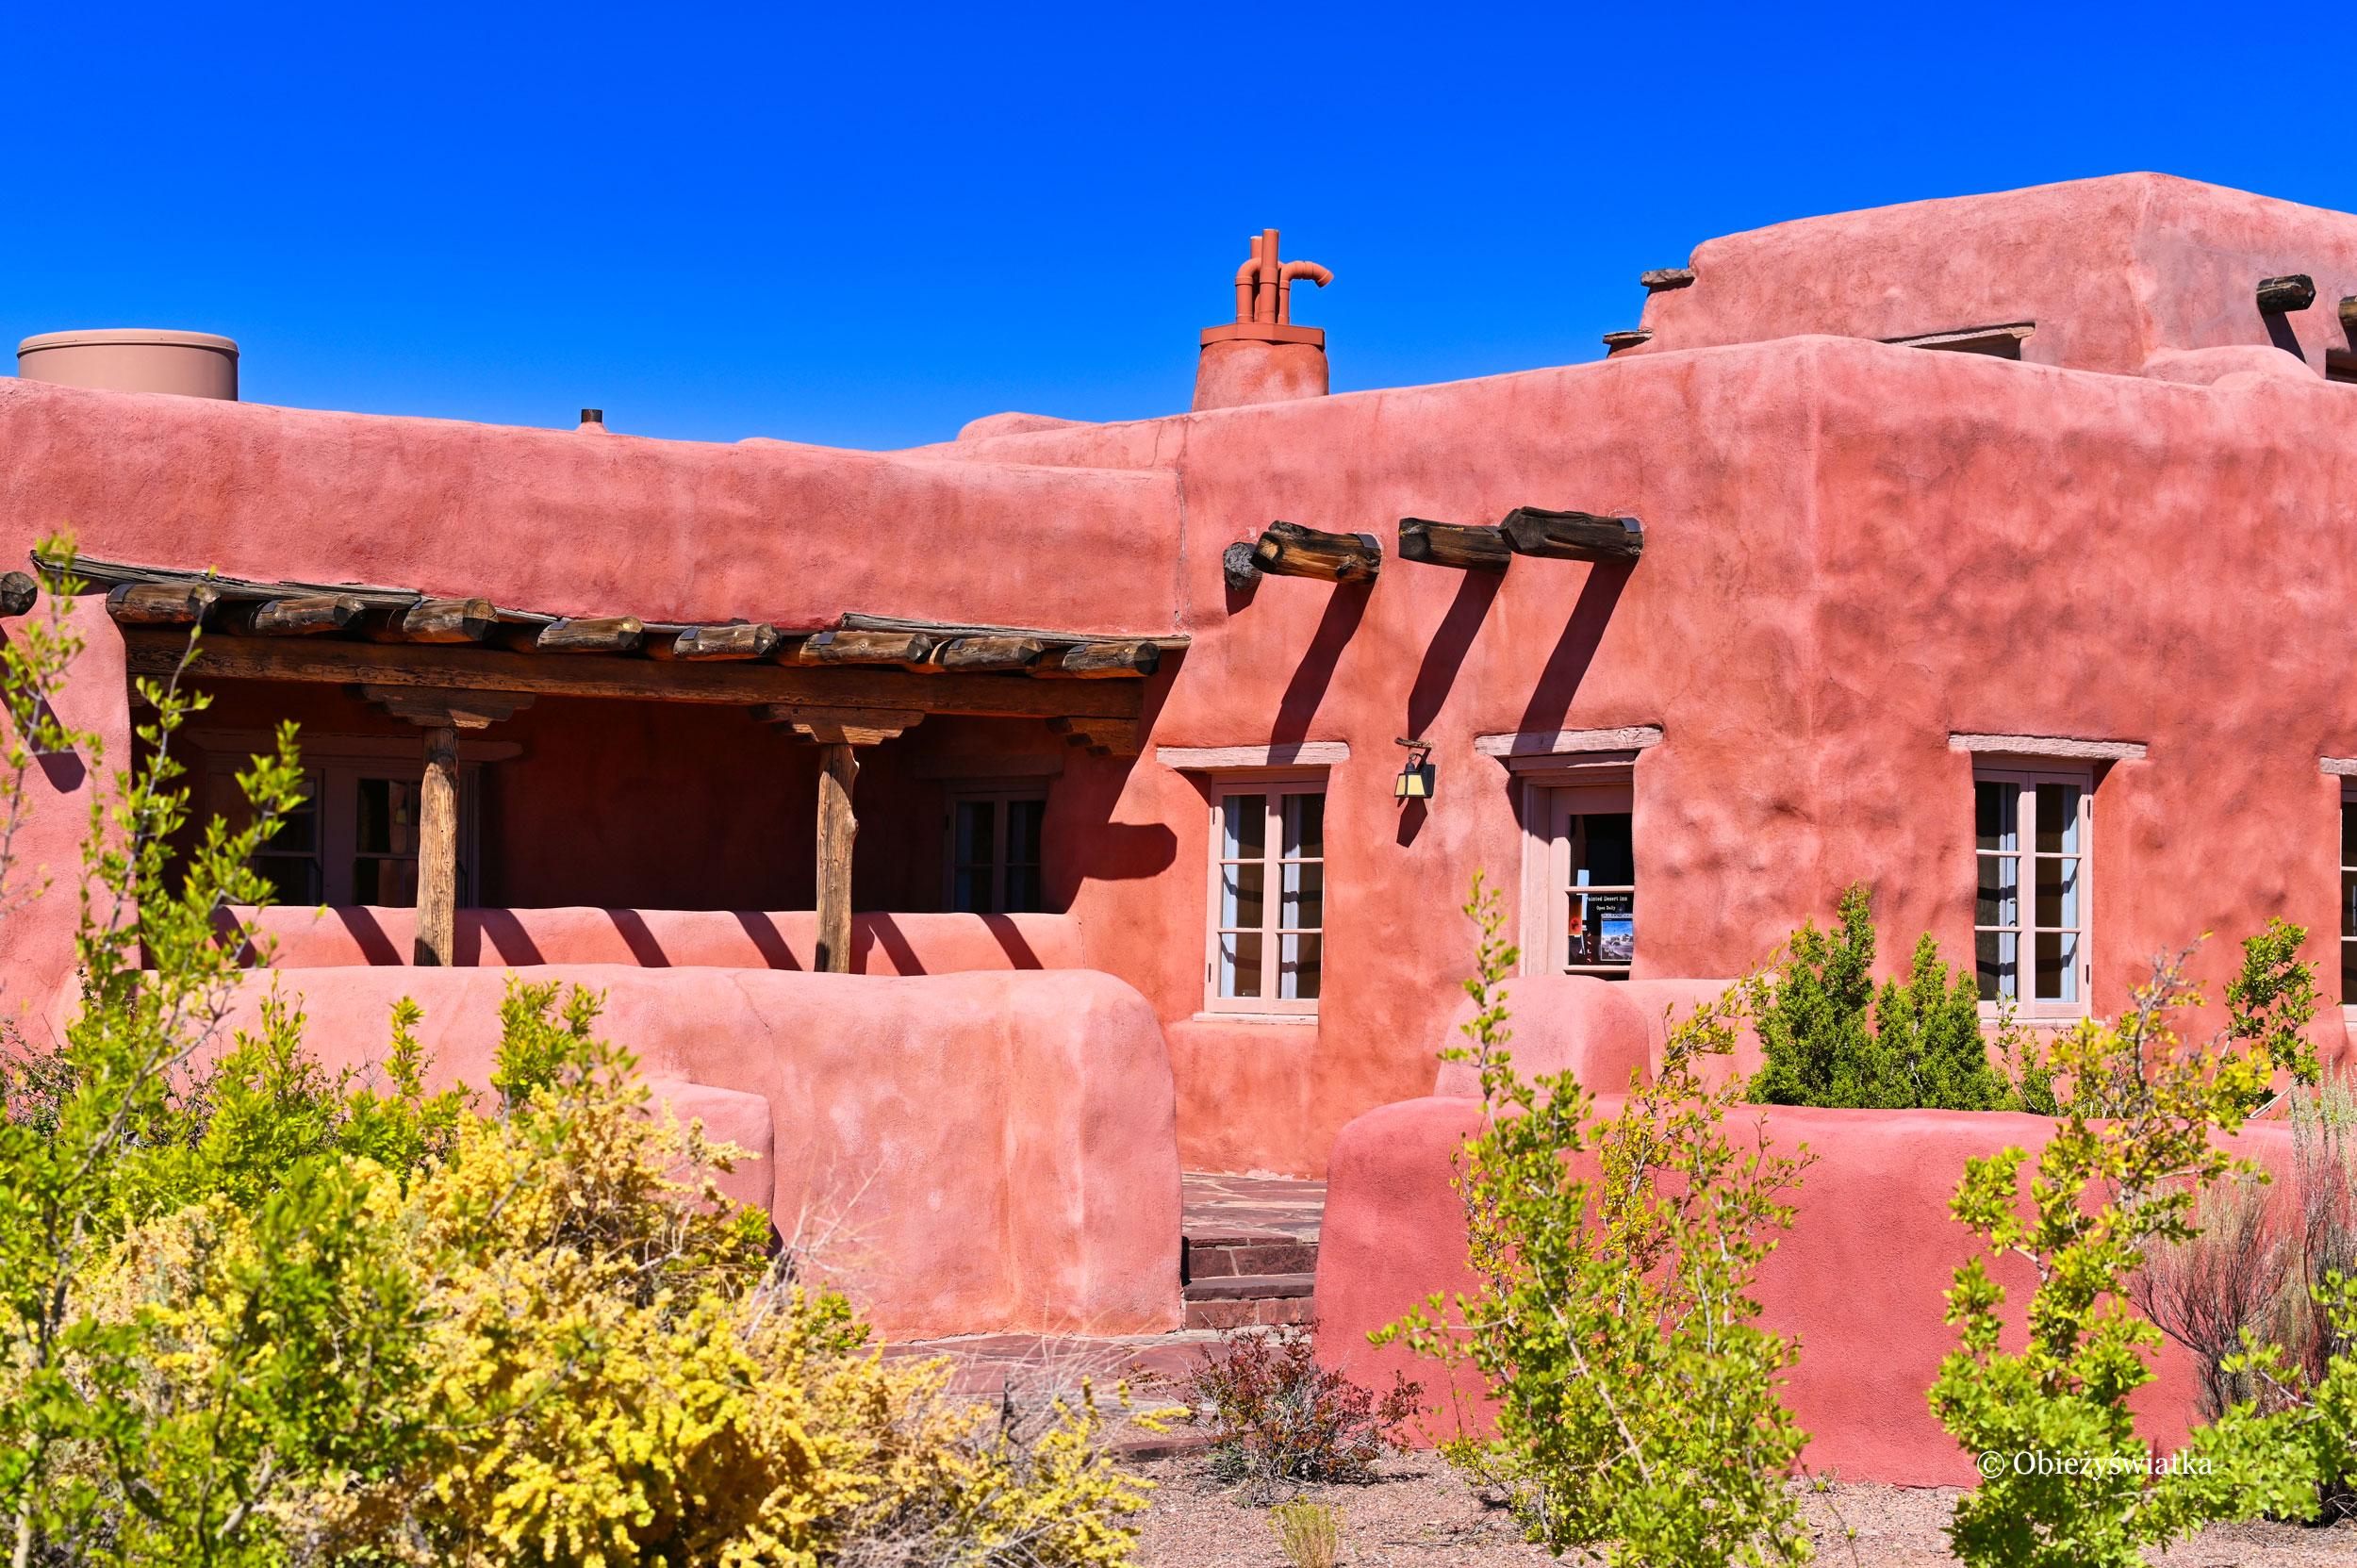 Painted Desert Inn w stylu Pueblo Revival architecture, Painted Desert, Arizona, USA